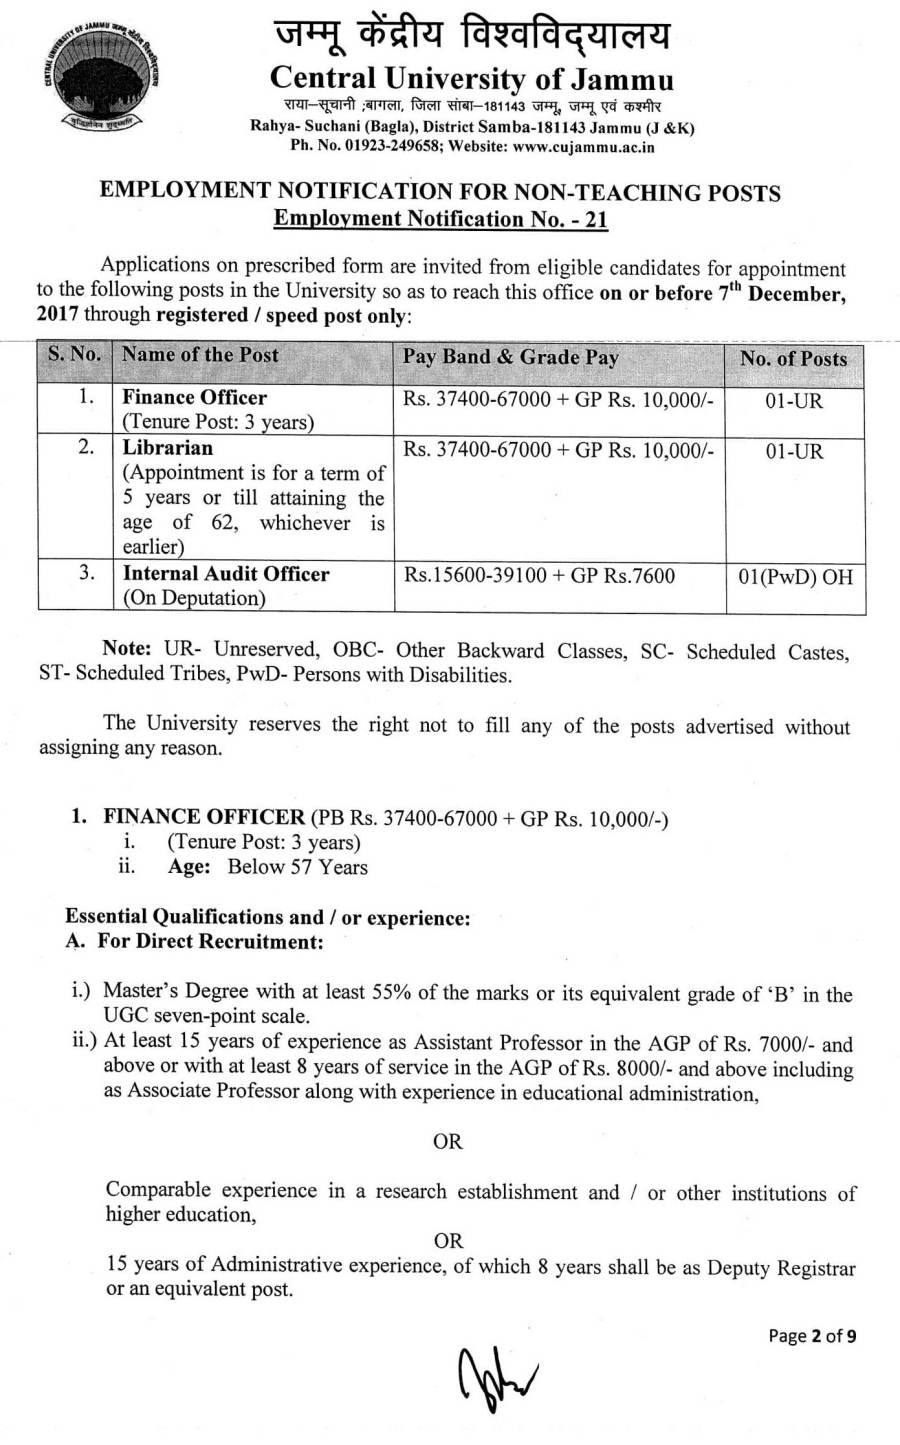 Employment Notification No. 21 - NT-2.jpg